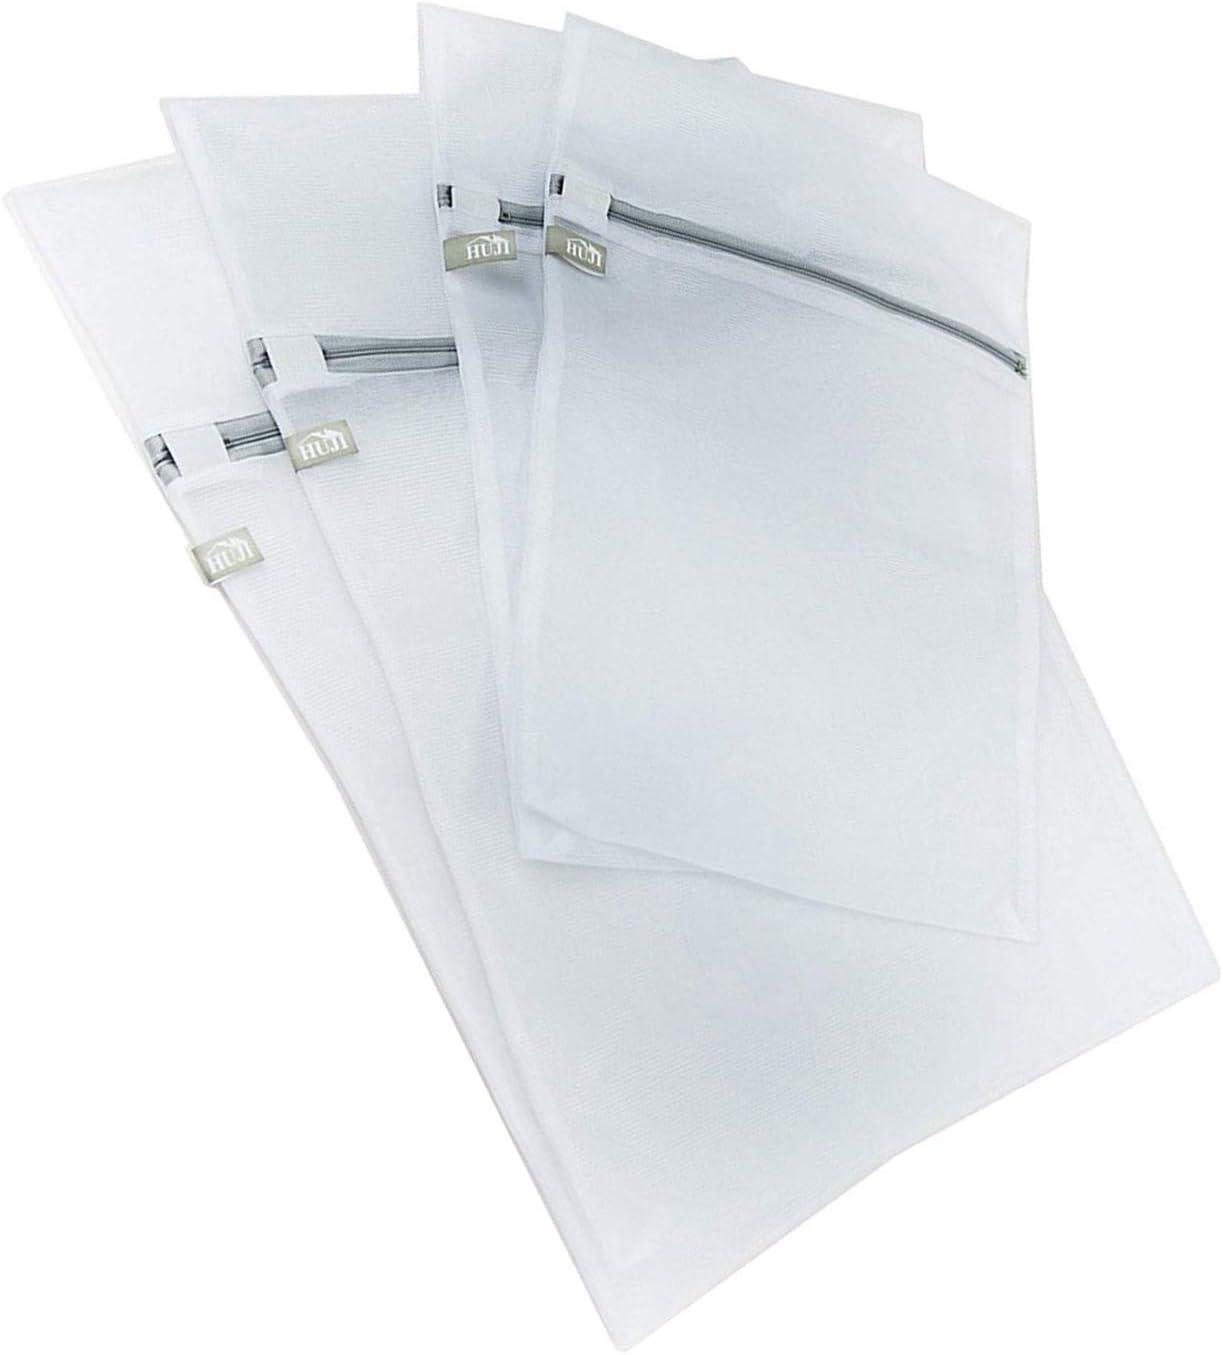 Huji 4 Pack Micro Mesh Laundry Bags Lingerie Bra Underwear with Secure Zipper (2 Medium & 2 Large)